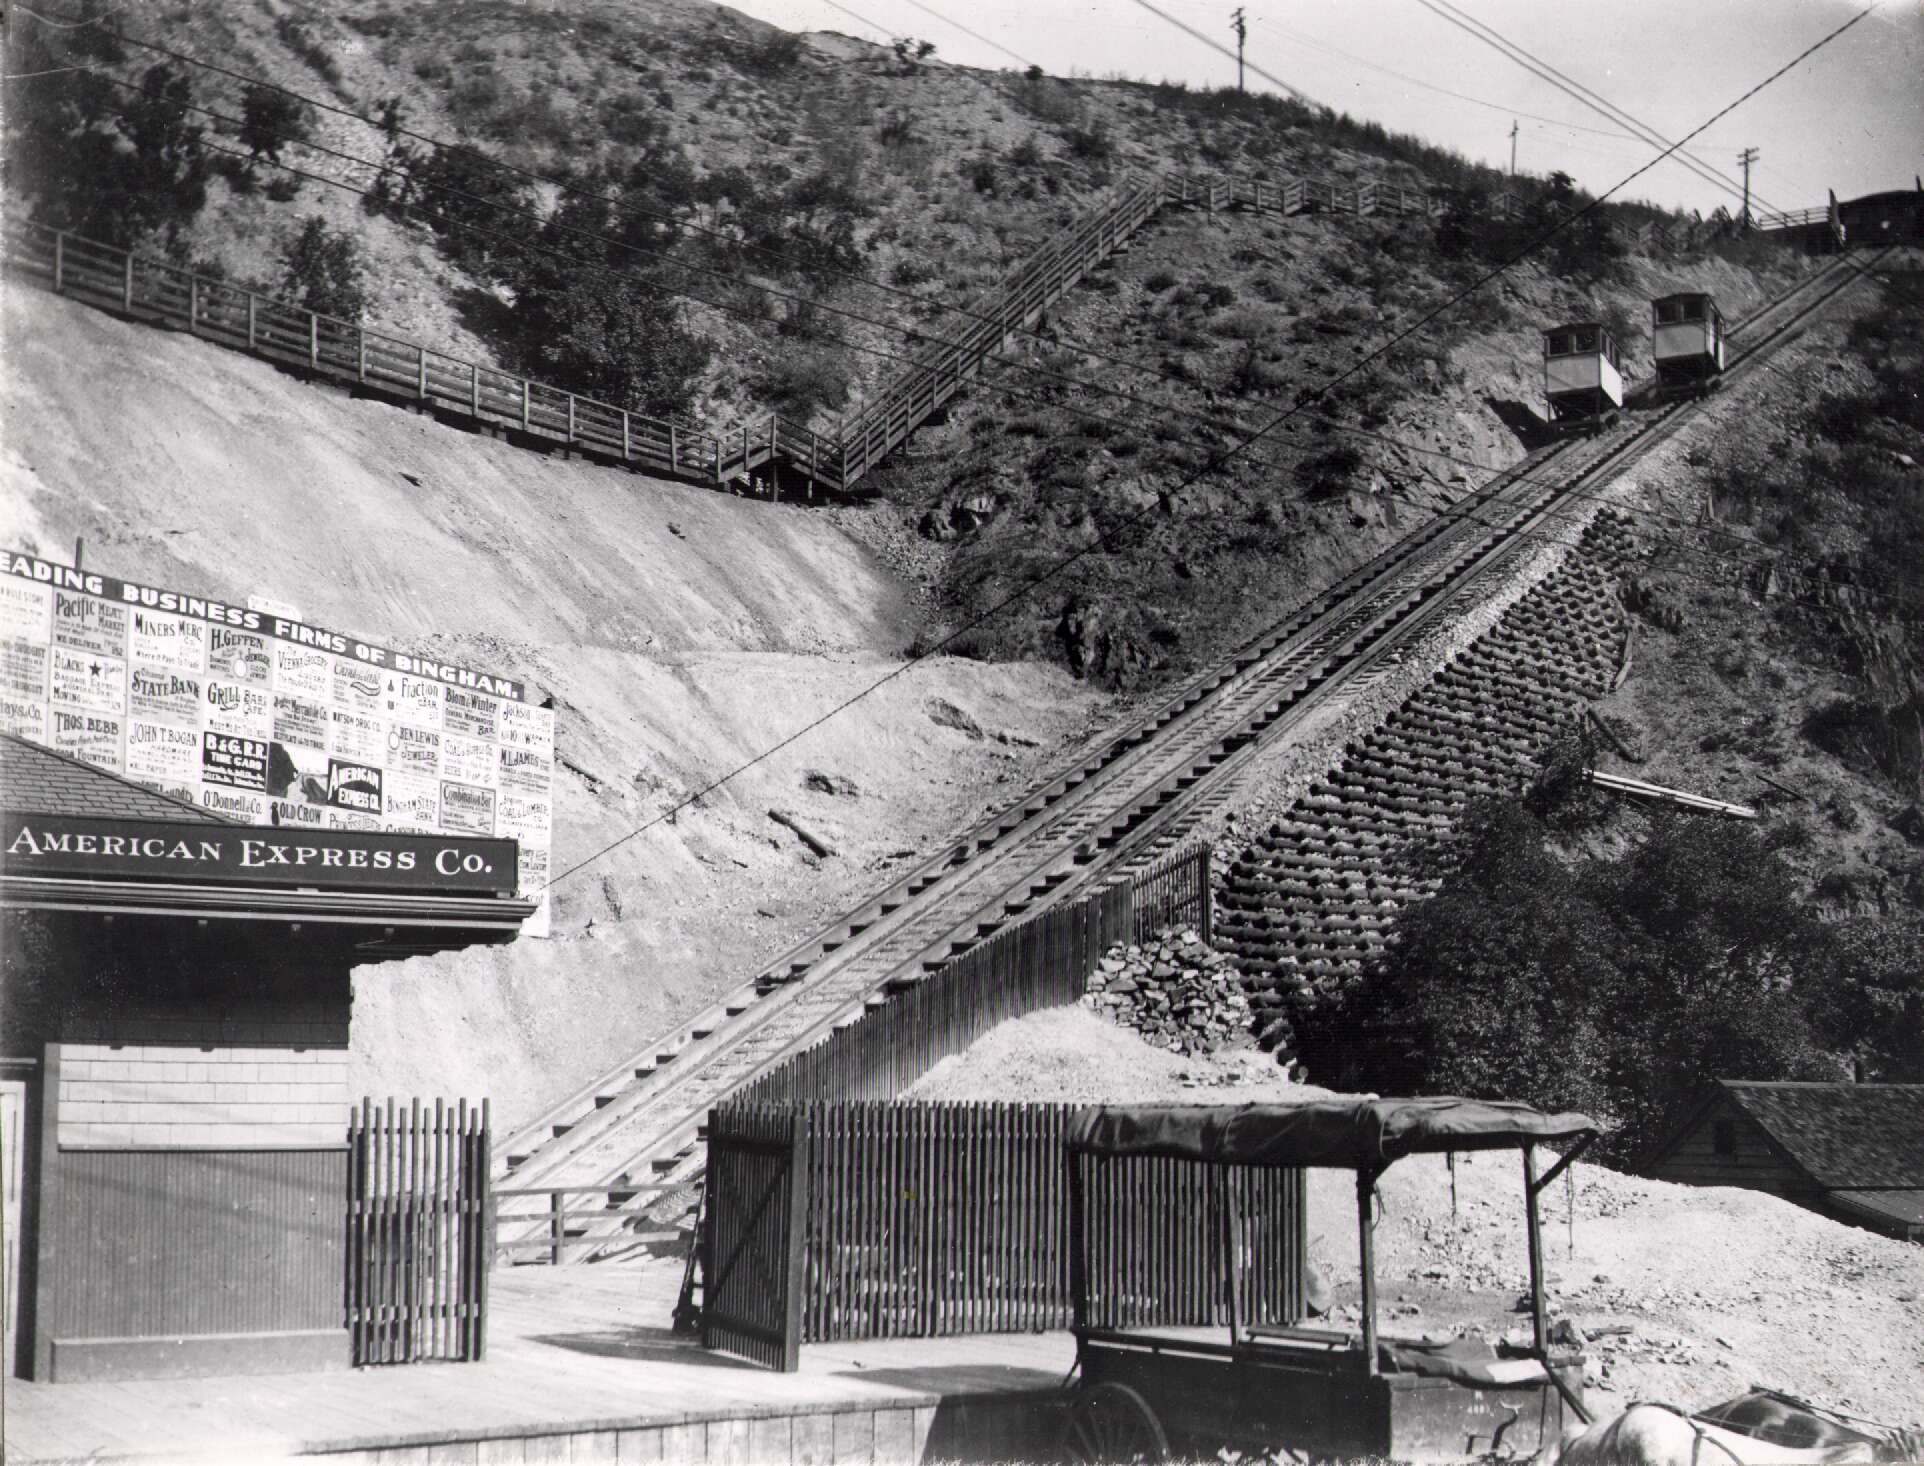 Kennecott Copper Mine - Bingham Canyon Incline (1909-1970)